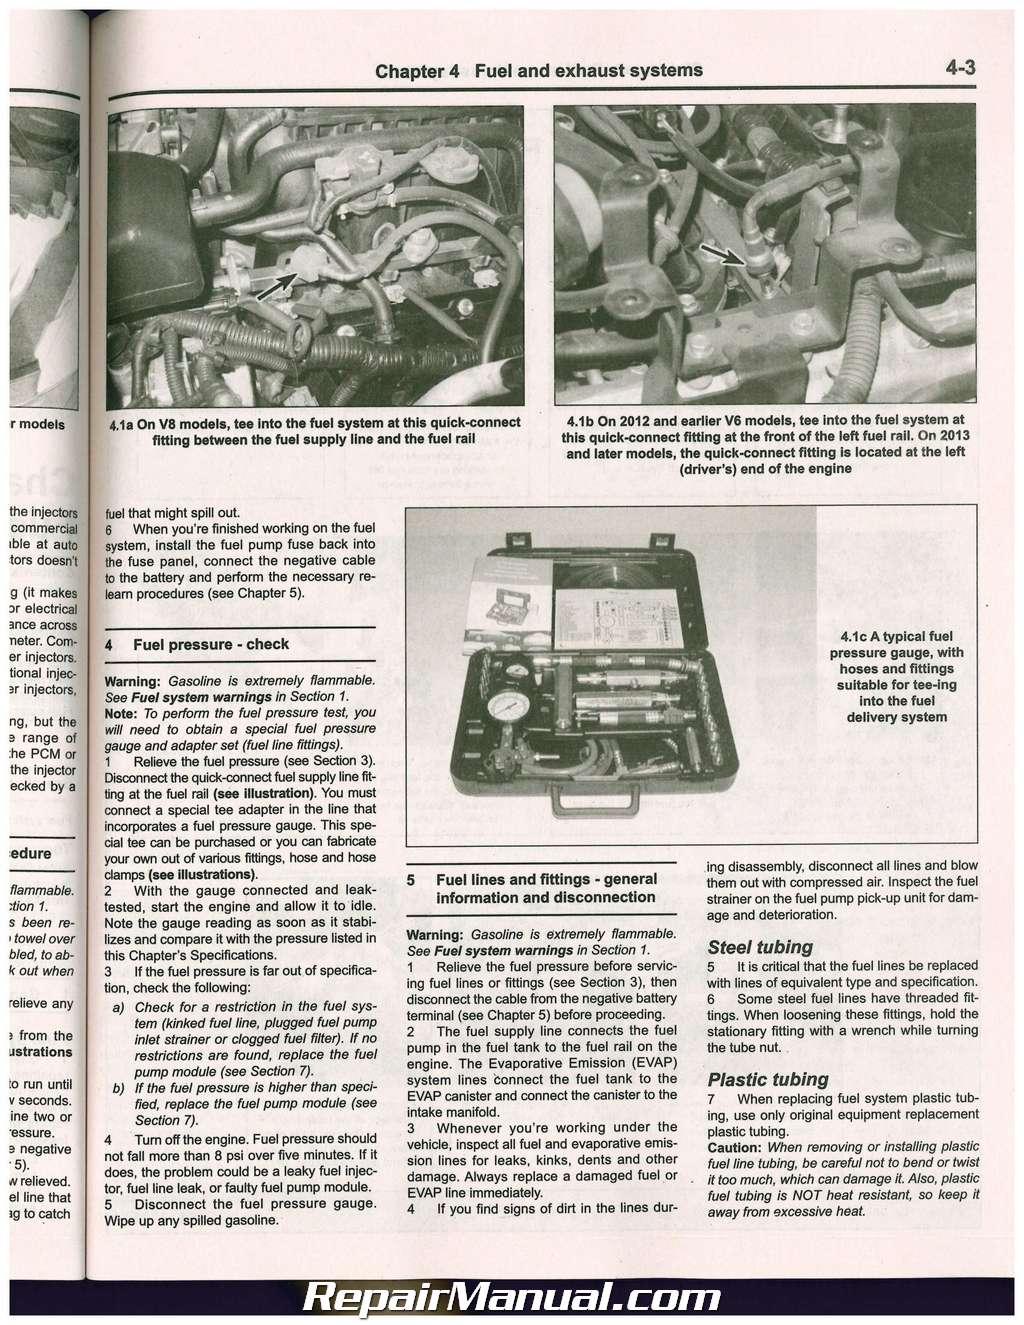 94 Nissan Pathfinder Repair Manual Good Owner Guide Website Td27 Engine Pdf 2005 2014 Haynes Suv Rh Repairmanual Com 1994 Service